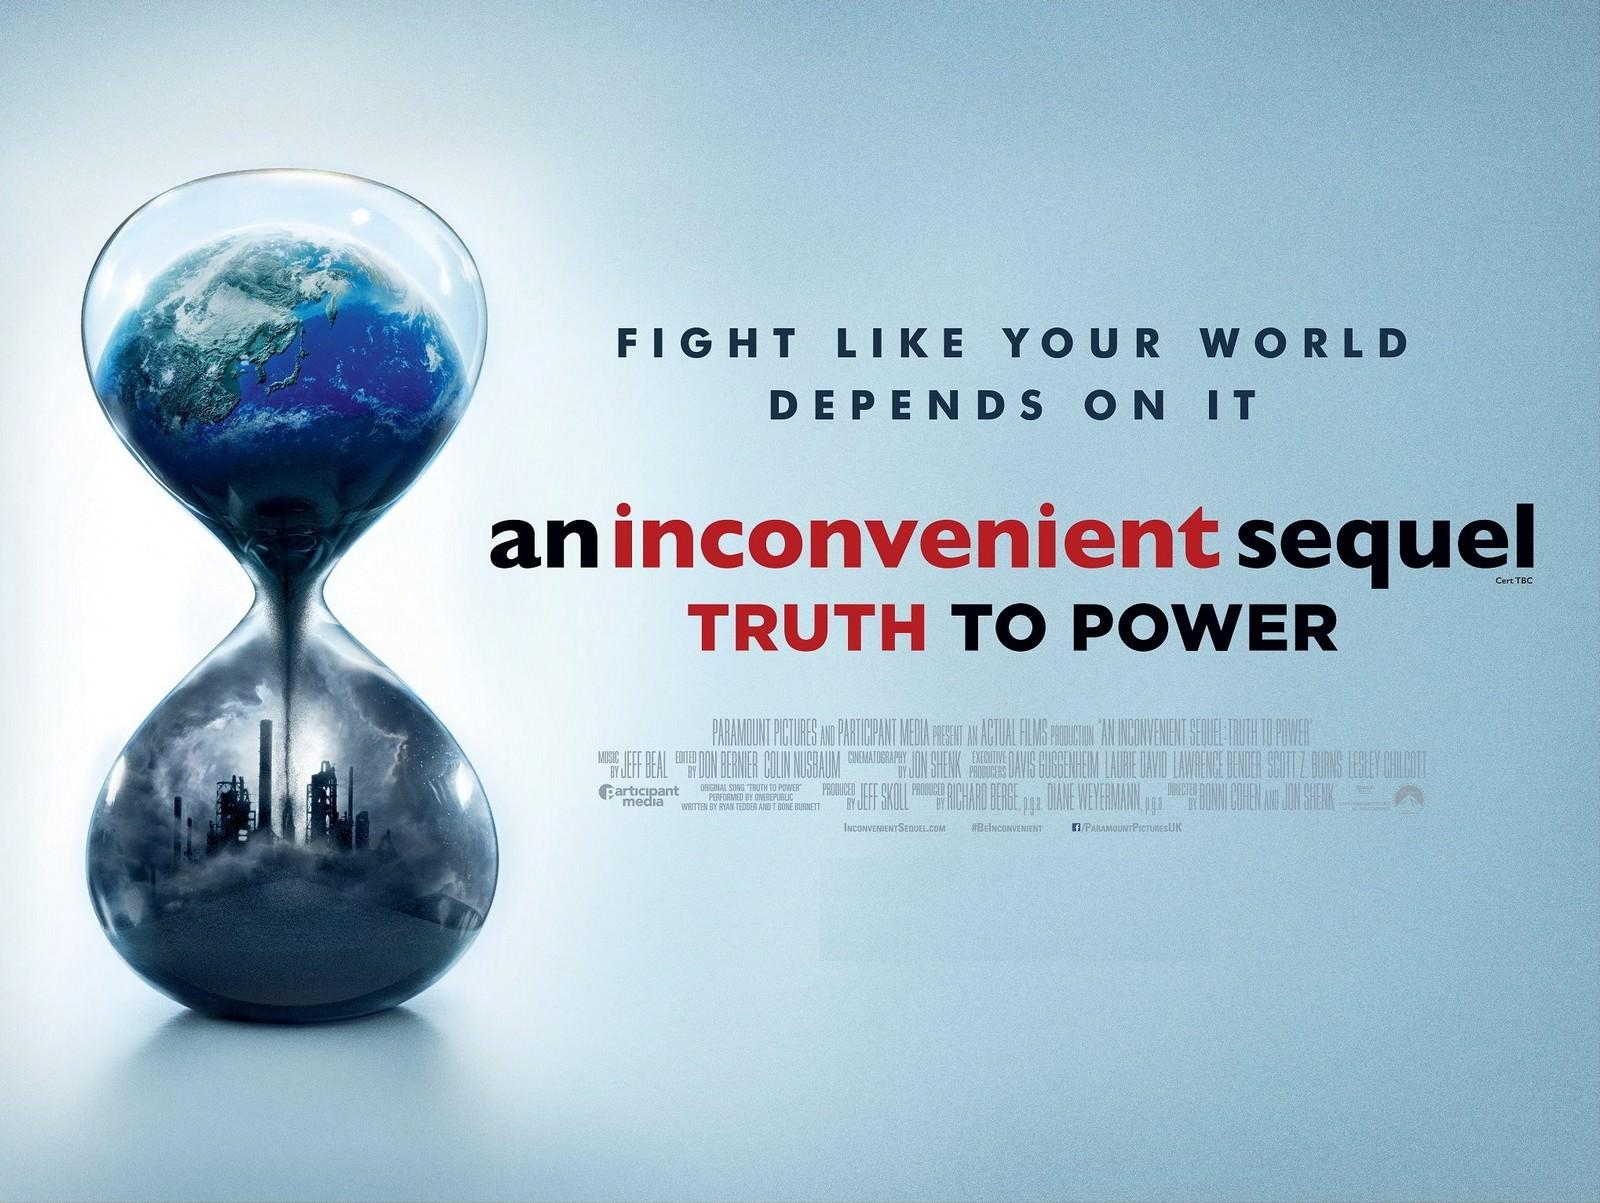 Movie, An Inconvenient Sequel: Truth to Power(美國, 2017年) / 不願面對的真相2(台灣) / 絕望真相2(香港) / 难以忽视的真相2(網路), 電影海報, 美國, 橫版